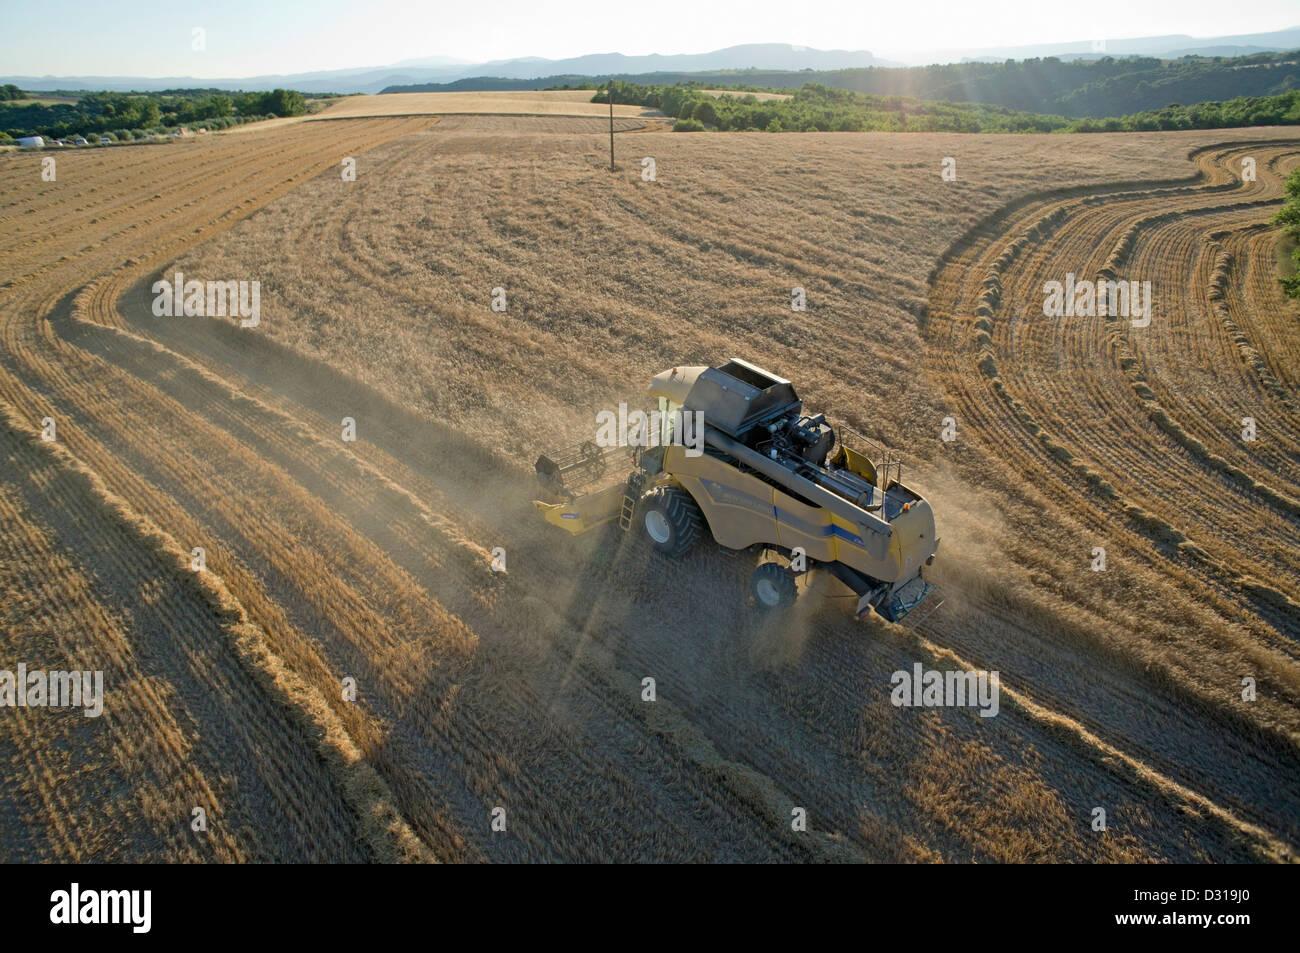 Farmer harvest wheat using combine harvester, South of France - Stock Image